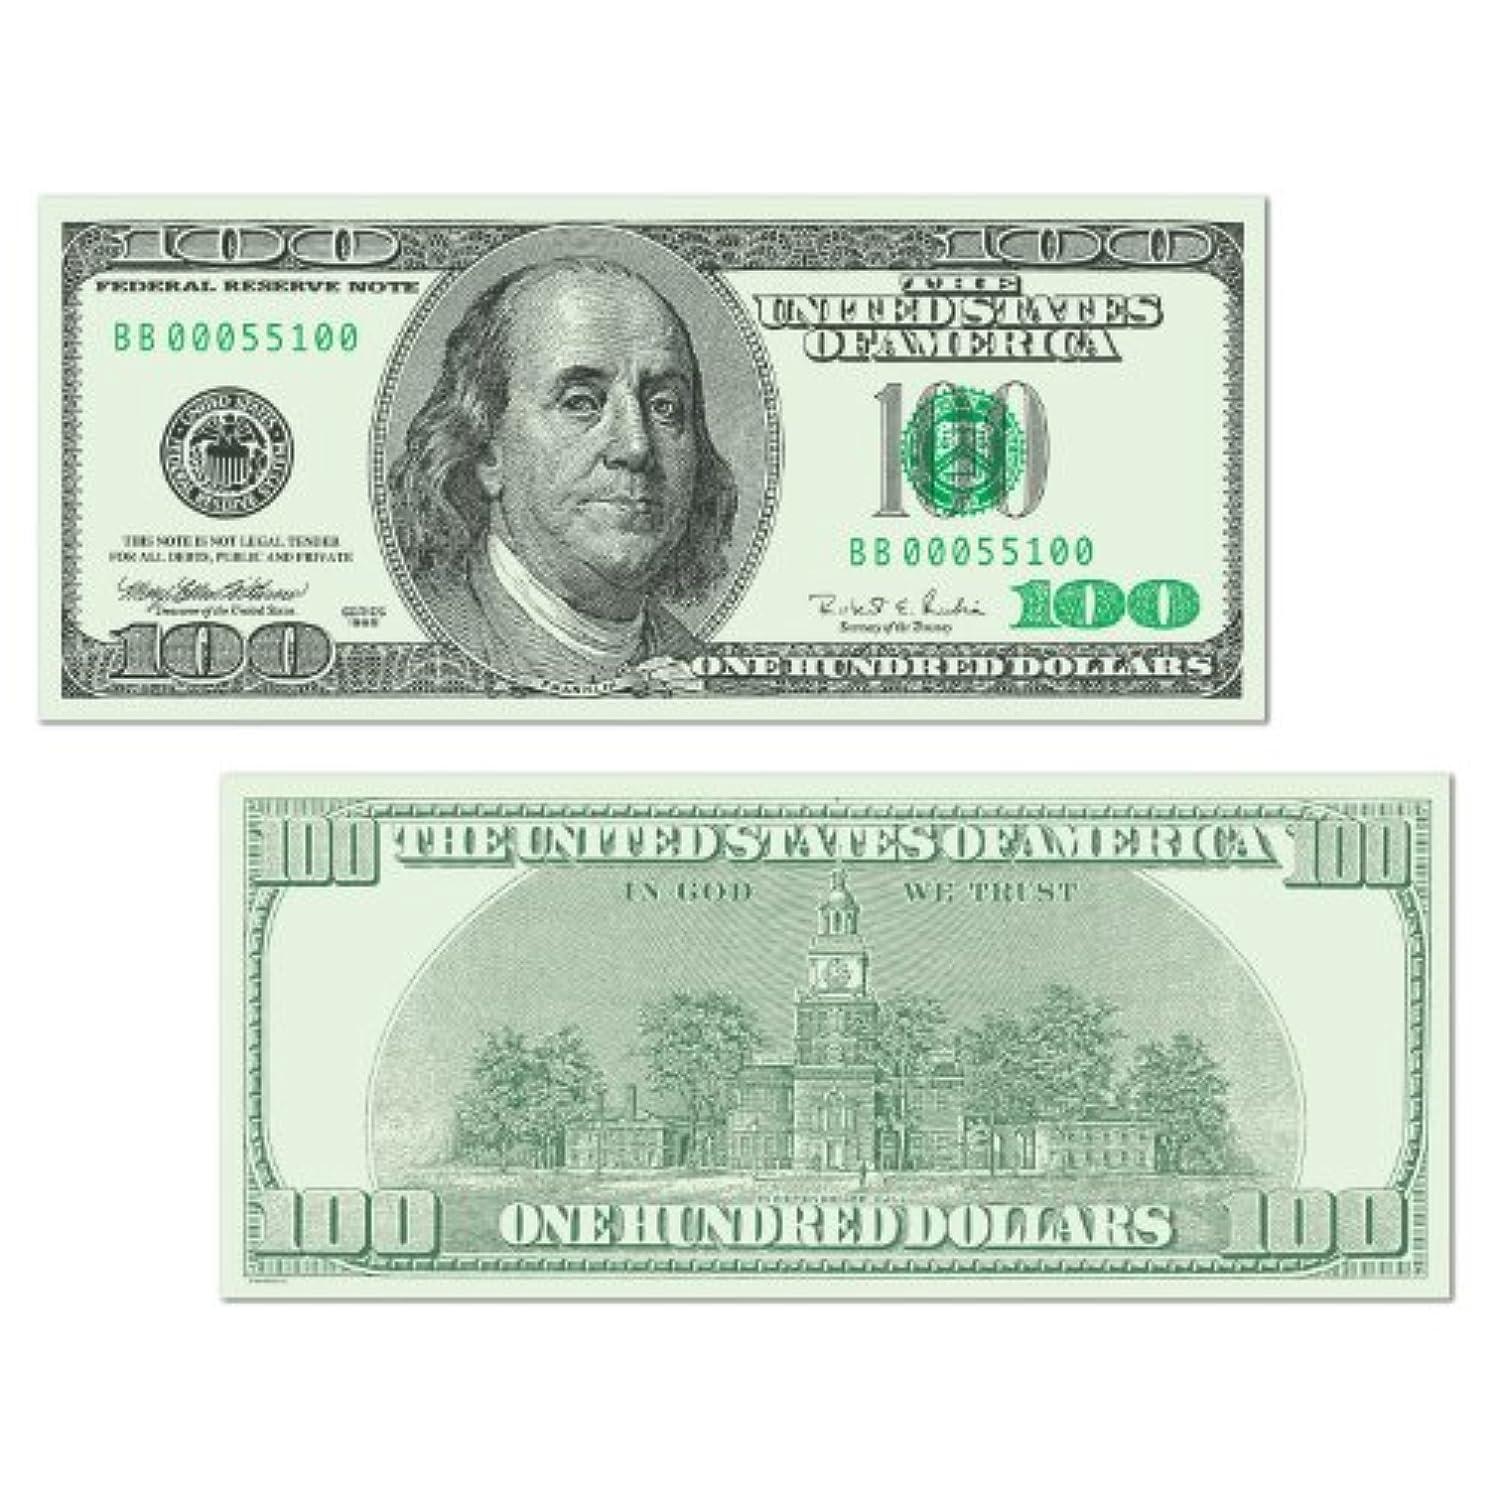 Beistle 55100 24-Pack Big Bucks Cutout Dollar 100 Bill Party Decoration, 7-1/2-Inch by 17-1/2-Inch